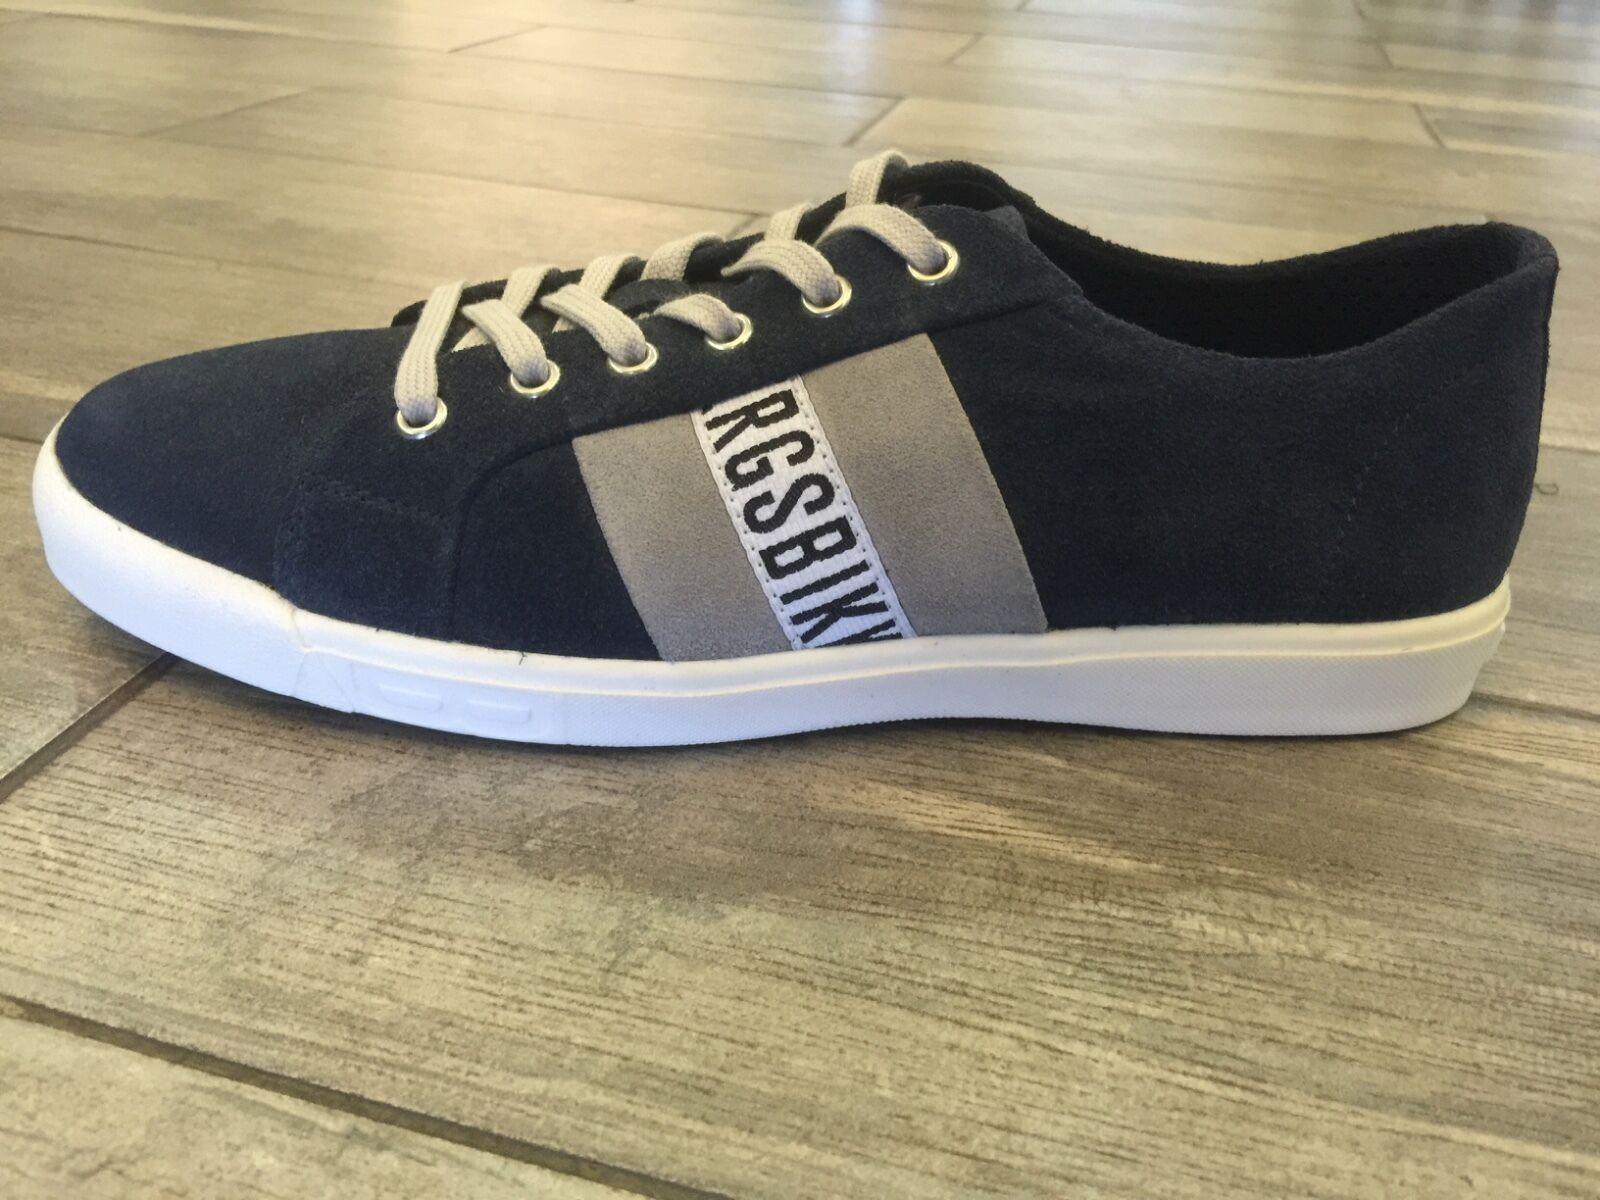 Scarpe casual da uomo  Dirk Bikkembergs uomos Shoes Trainers Sneakers Suede BKE107061 - New In Box